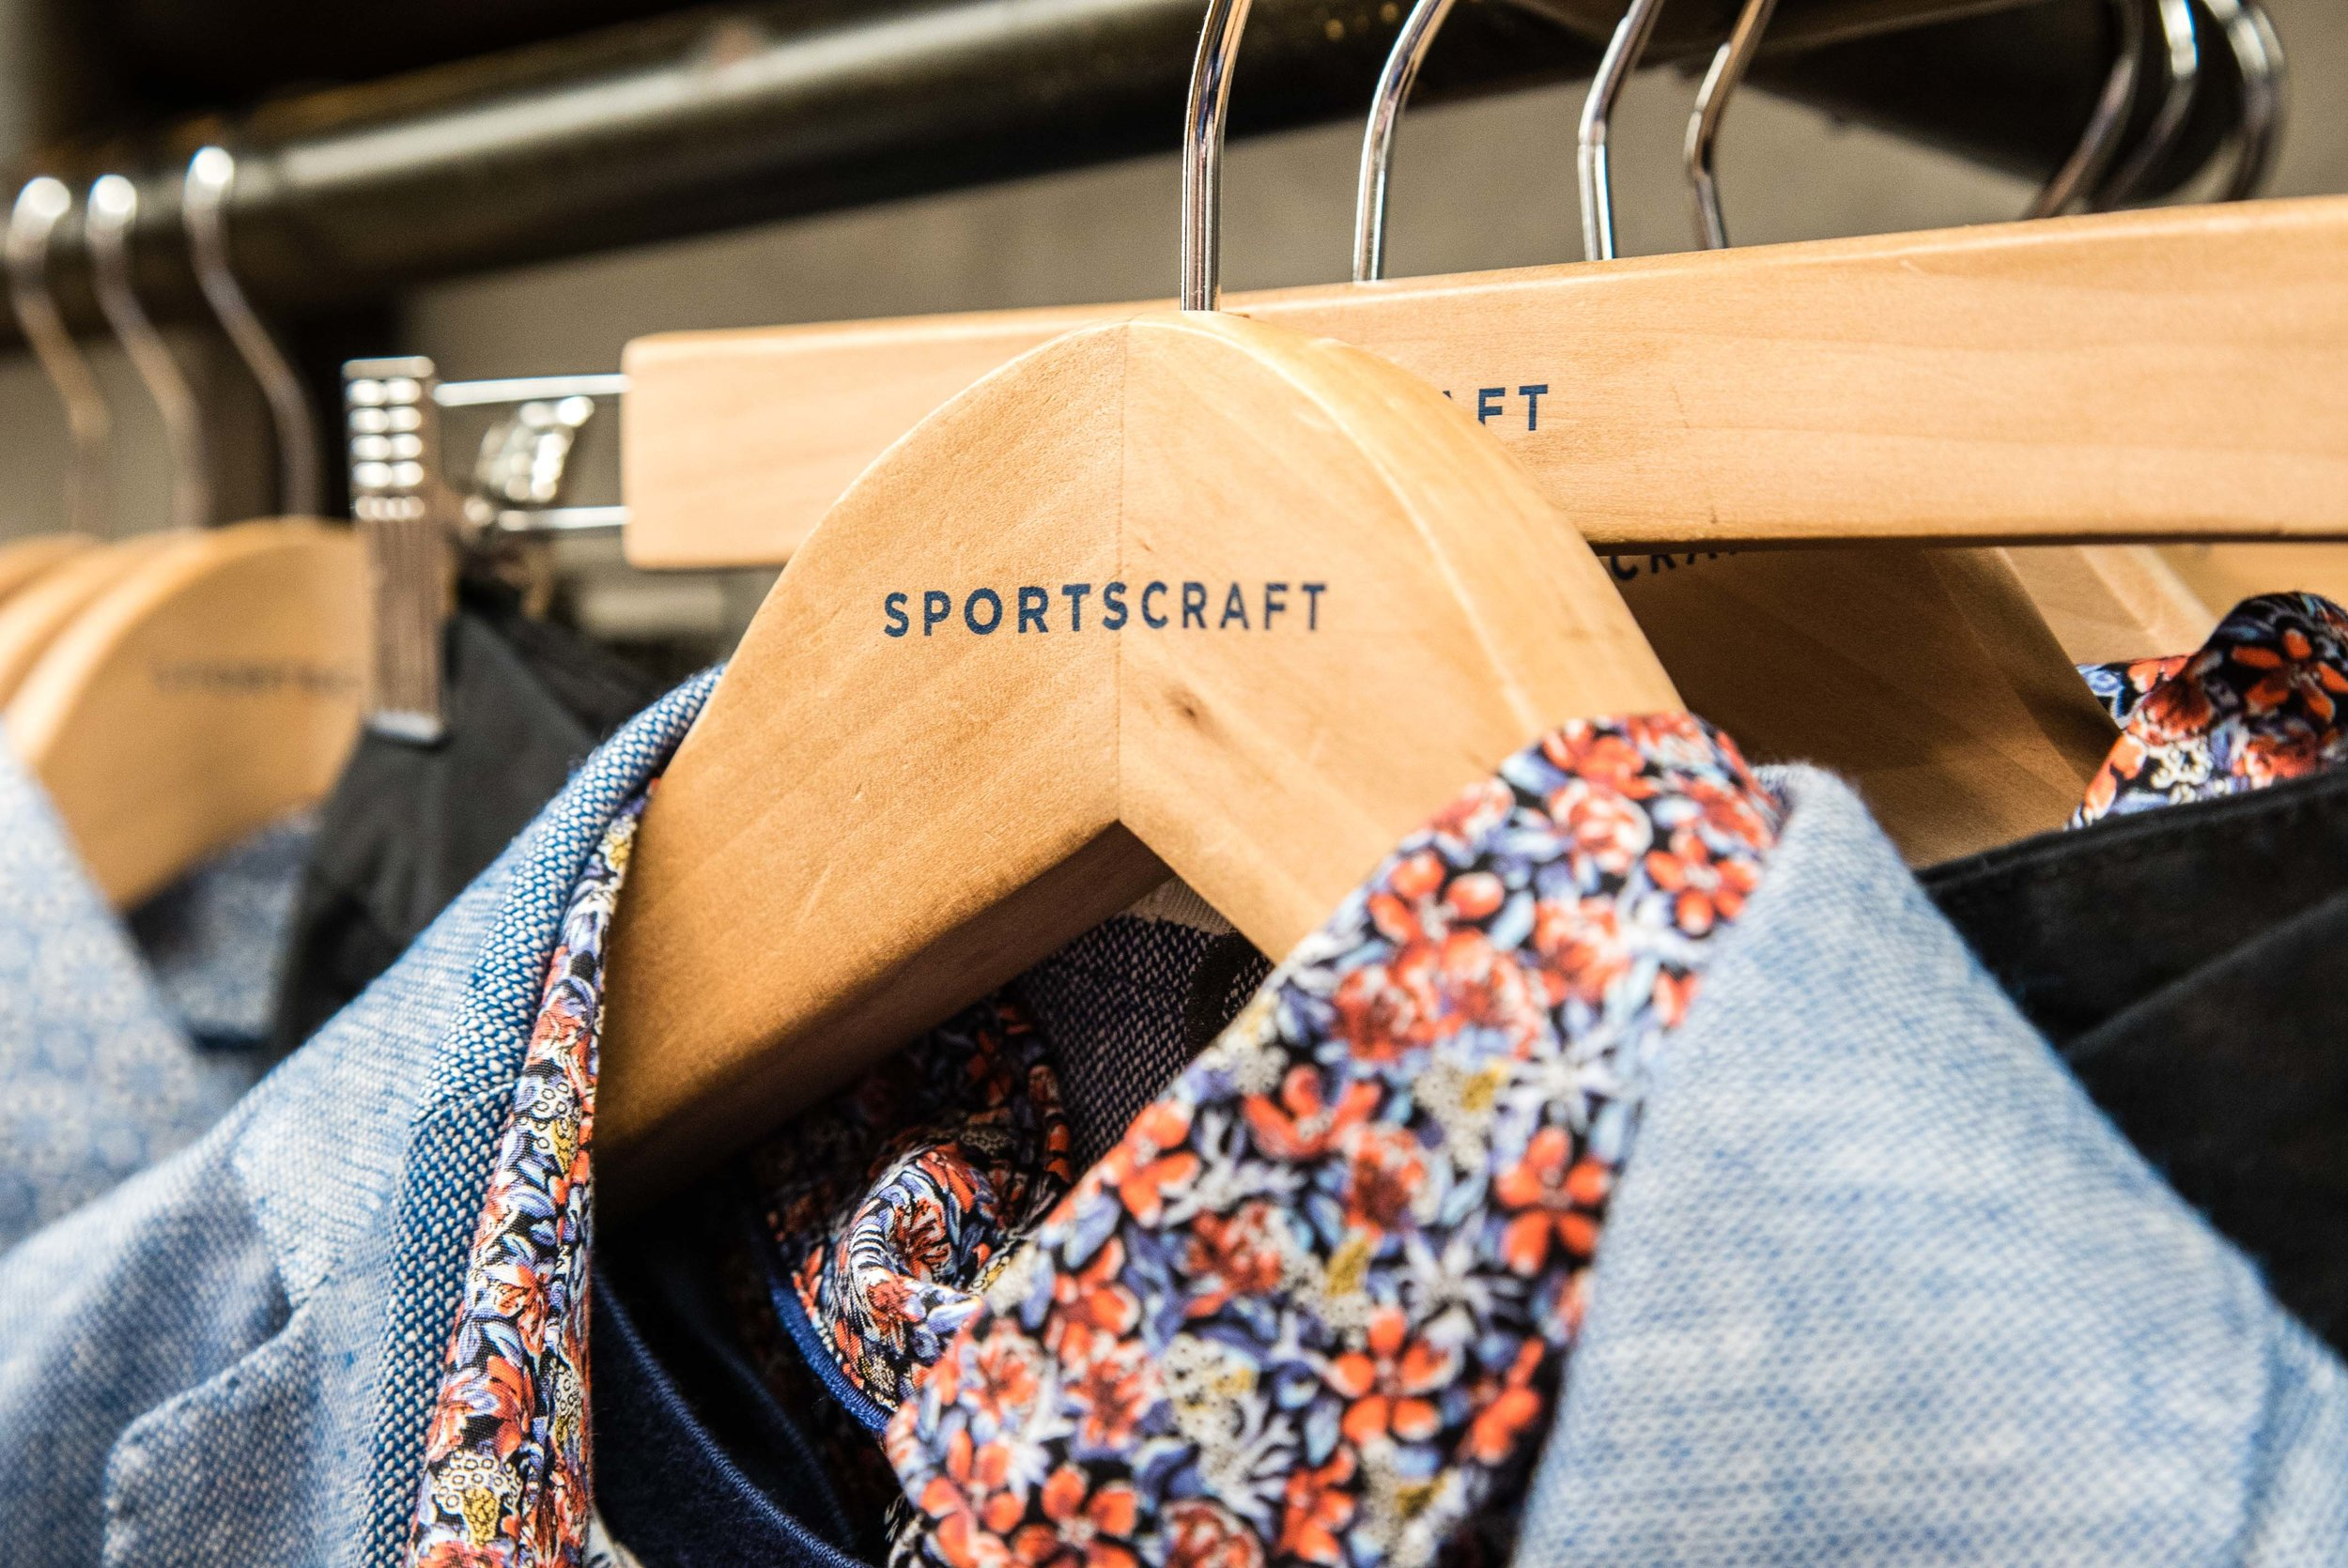 Sportscraft_westfield_syd-9_v1_current.jpg